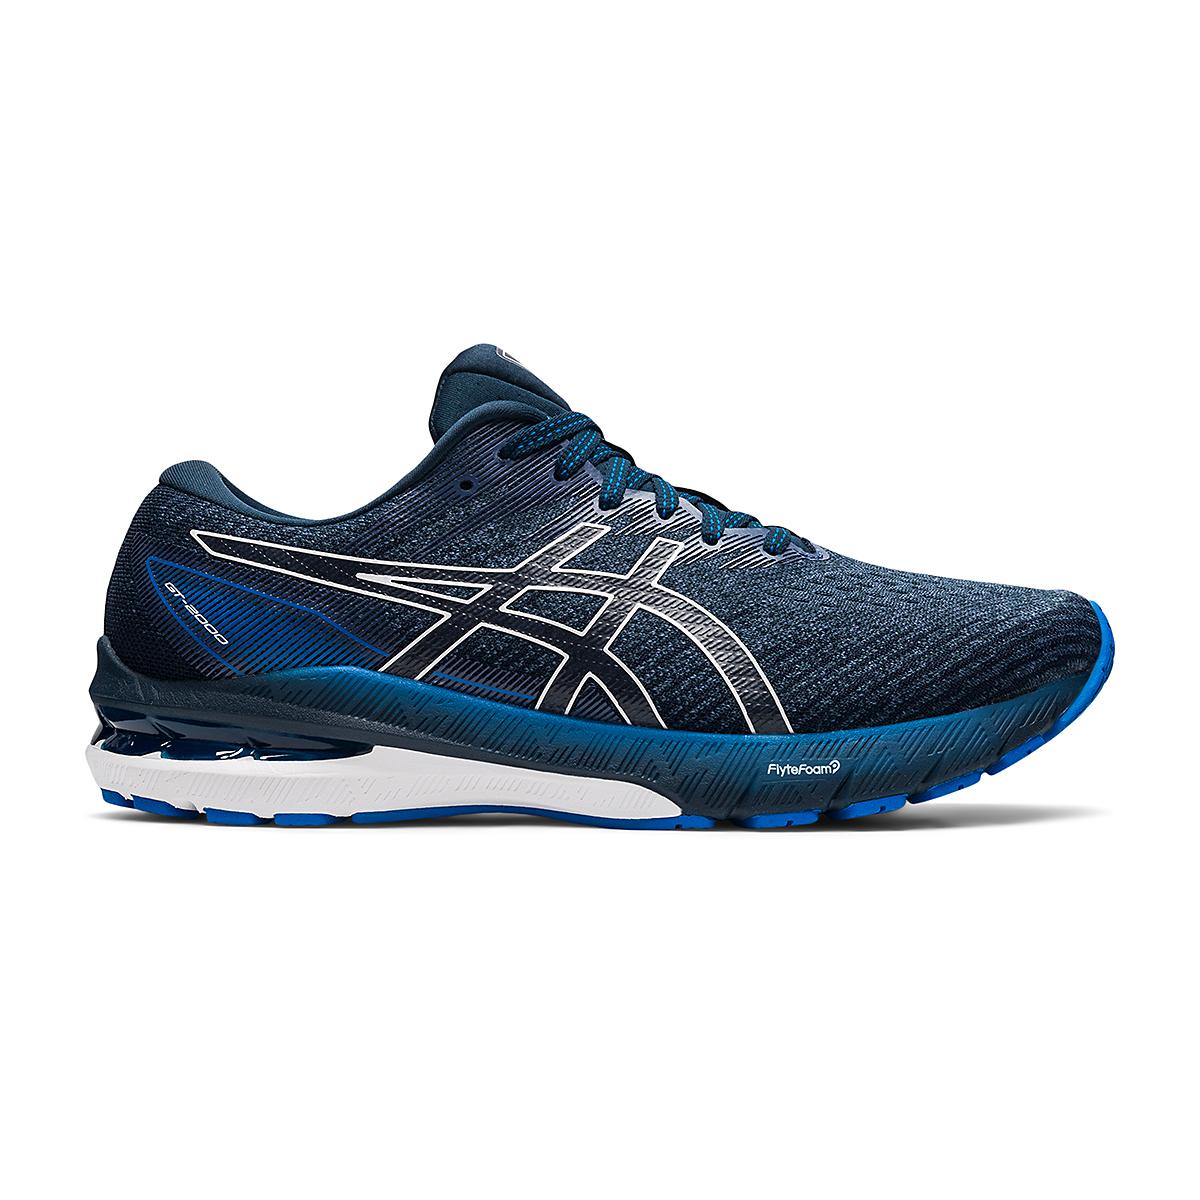 Men's Asics GT-2000 10 Running Shoe - Color: Thunder Blue/French Blue - Size: 7 - Width: Regular, Thunder Blue/French Blue, large, image 1